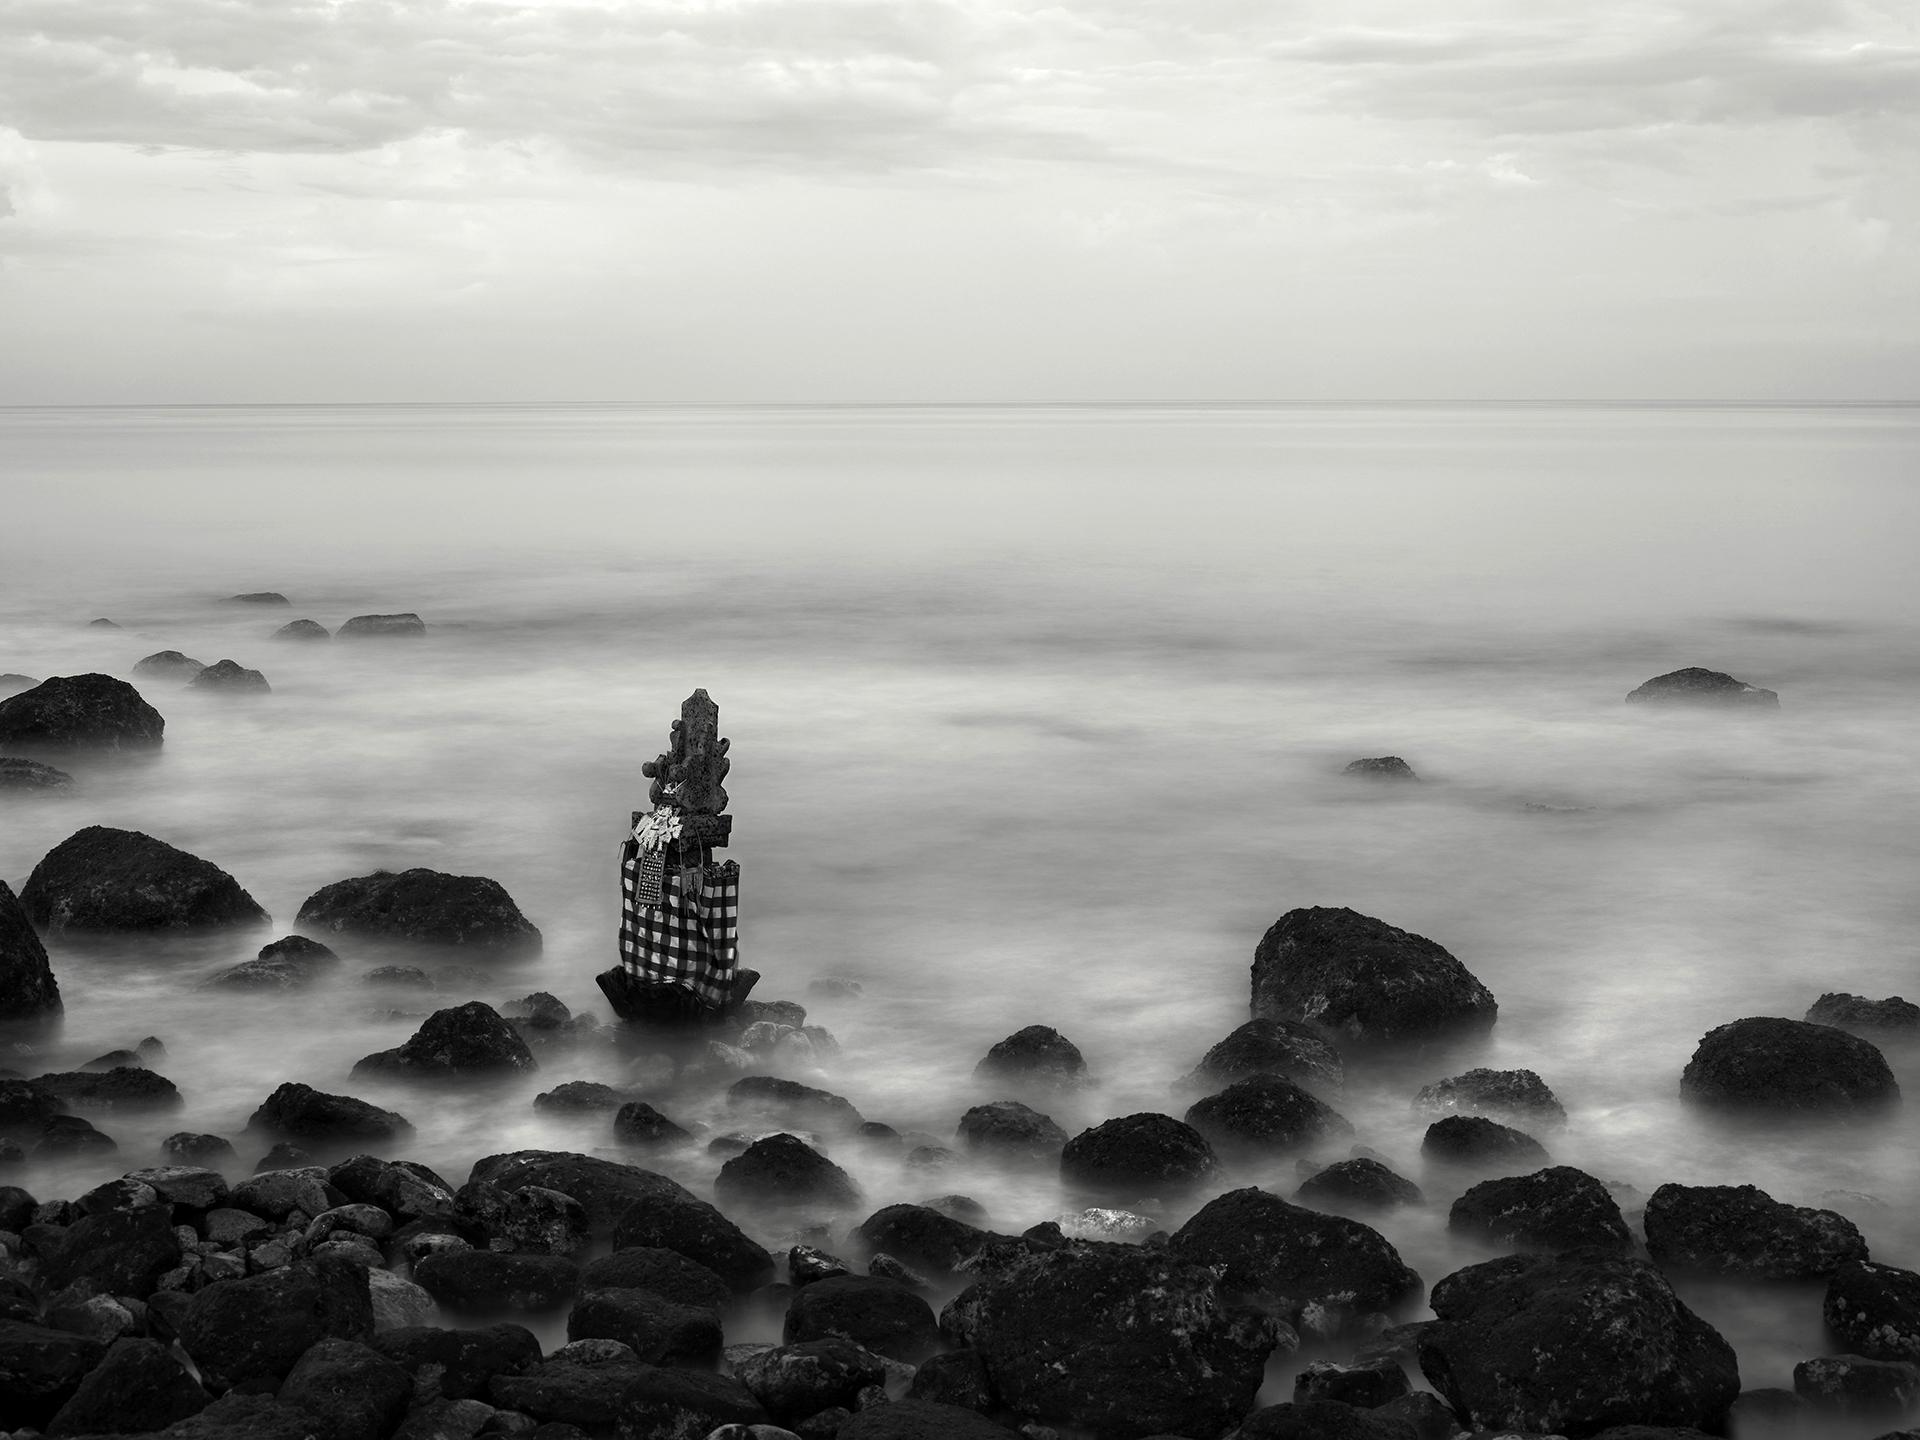 Offerings to the Sea #4, Bali - 2010 copy.jpg